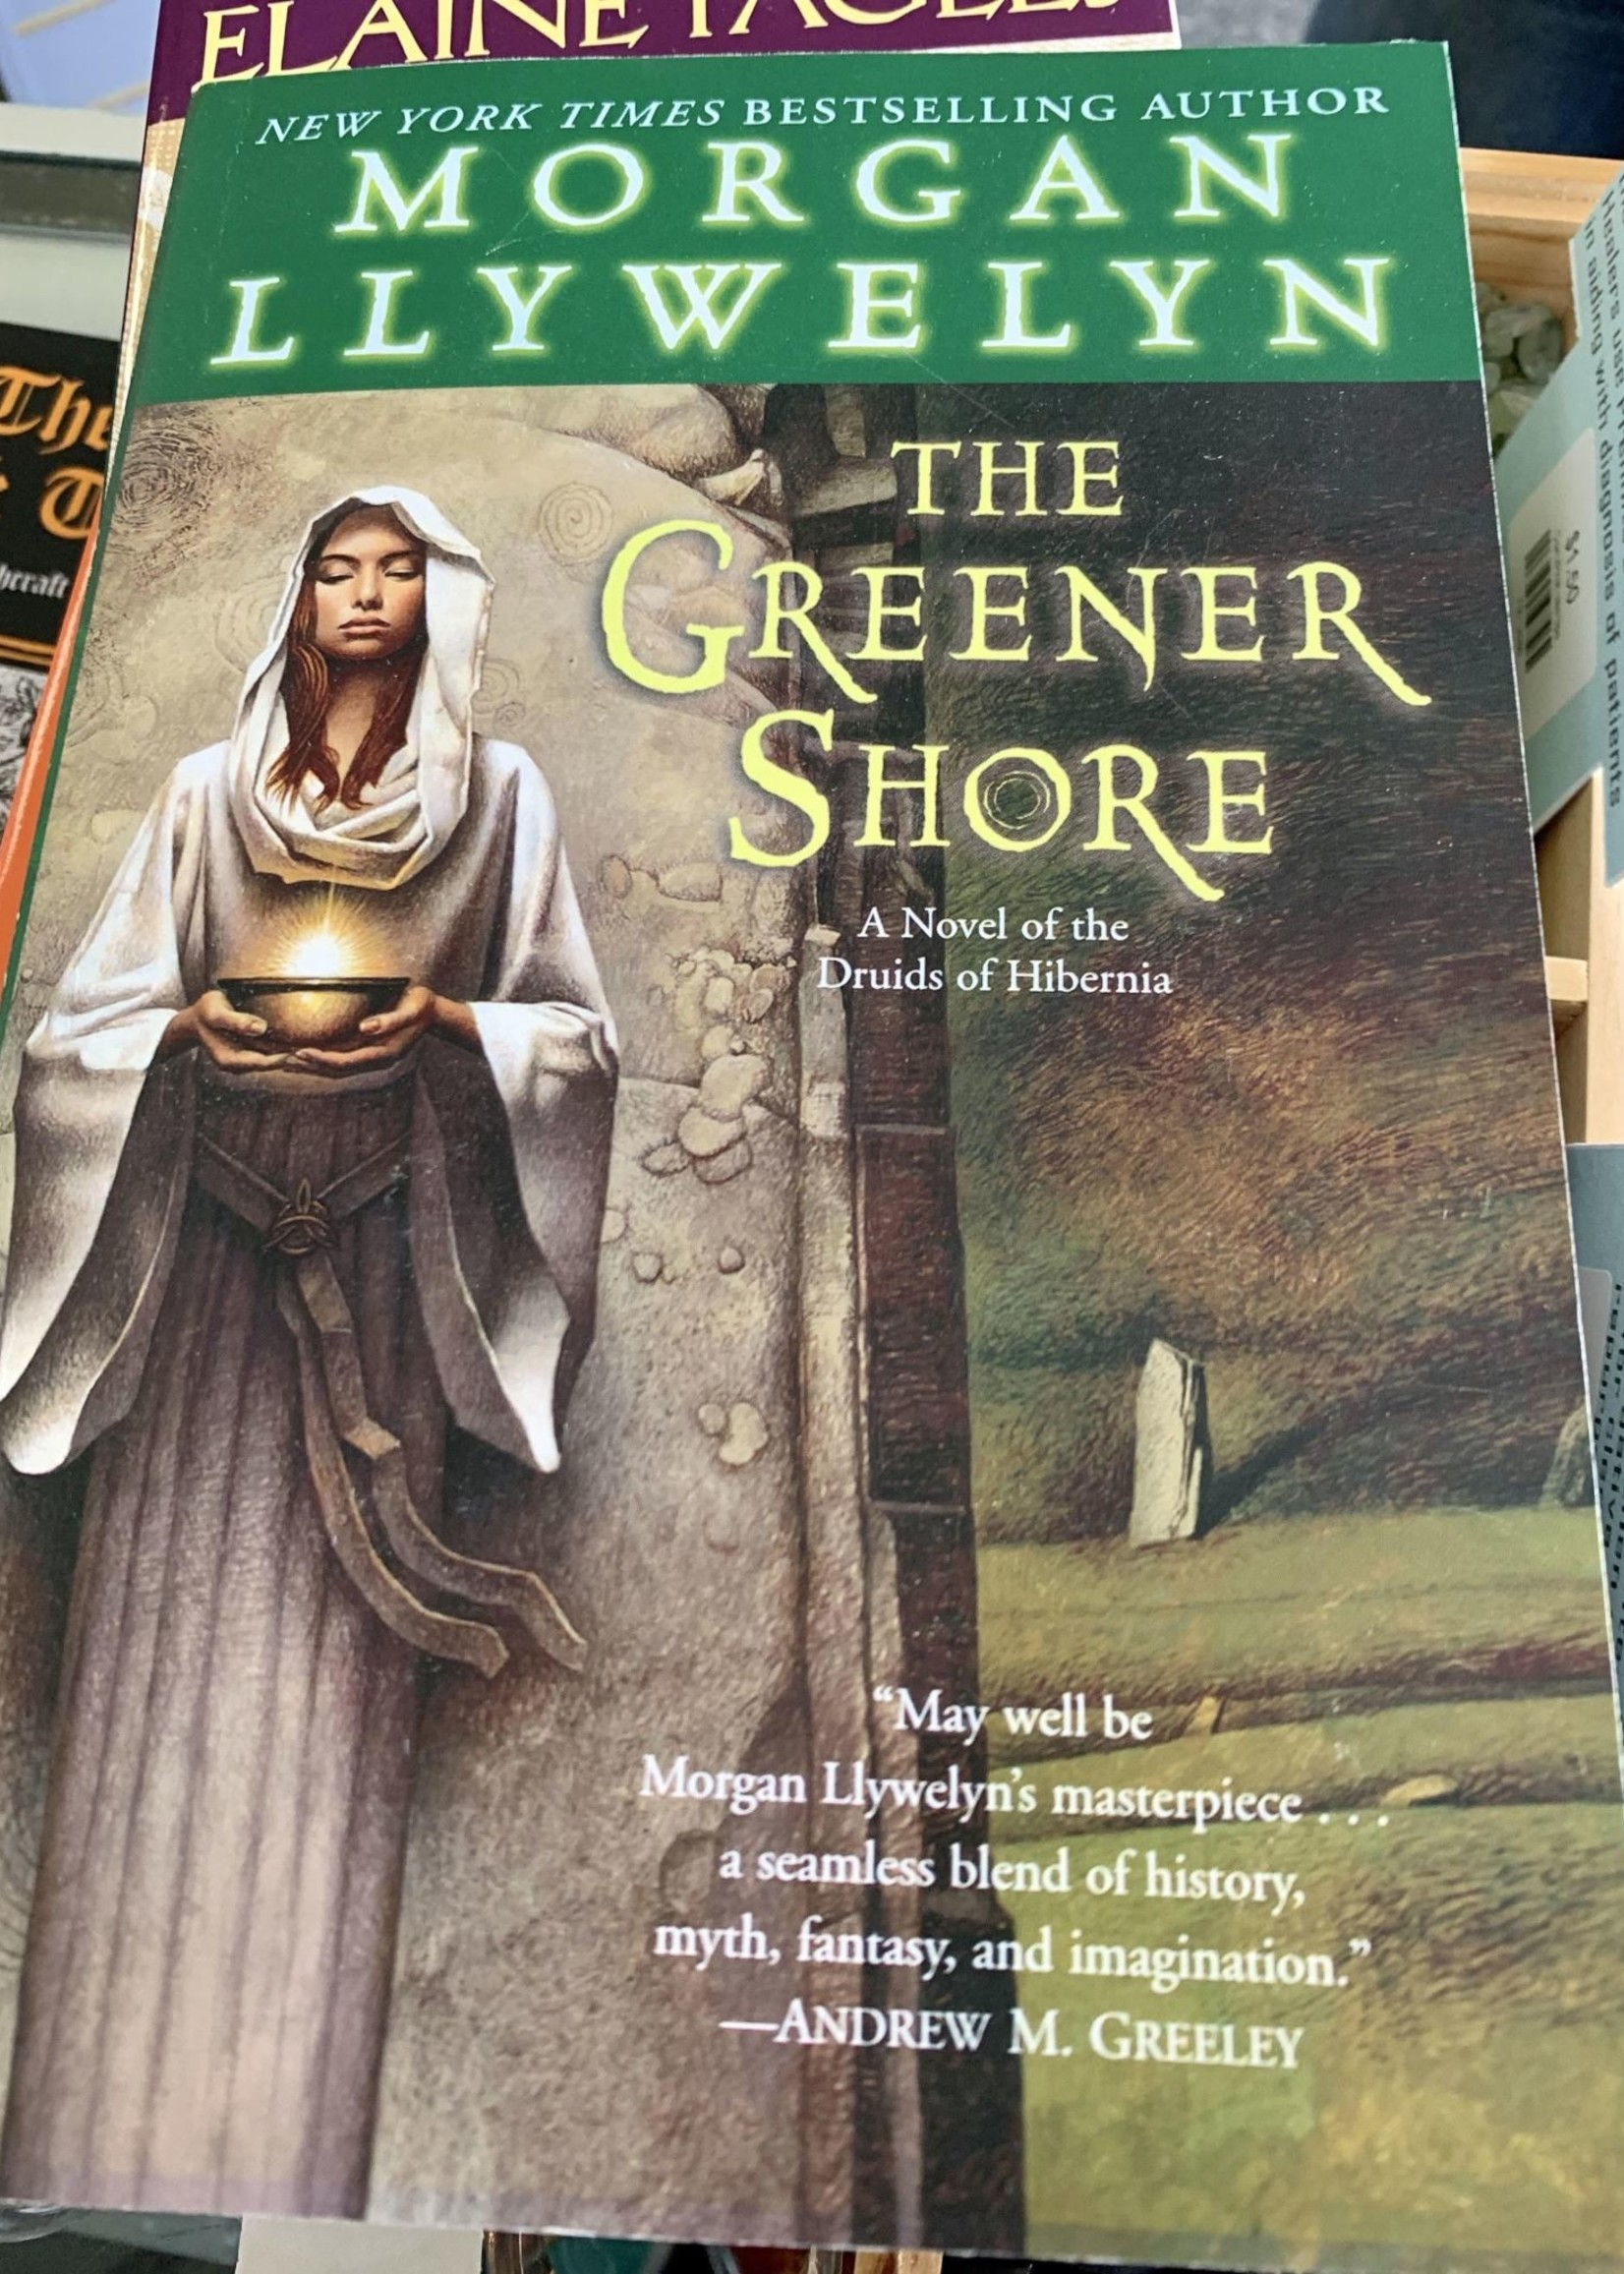 The Greener Shore - Morgan Llywelyn